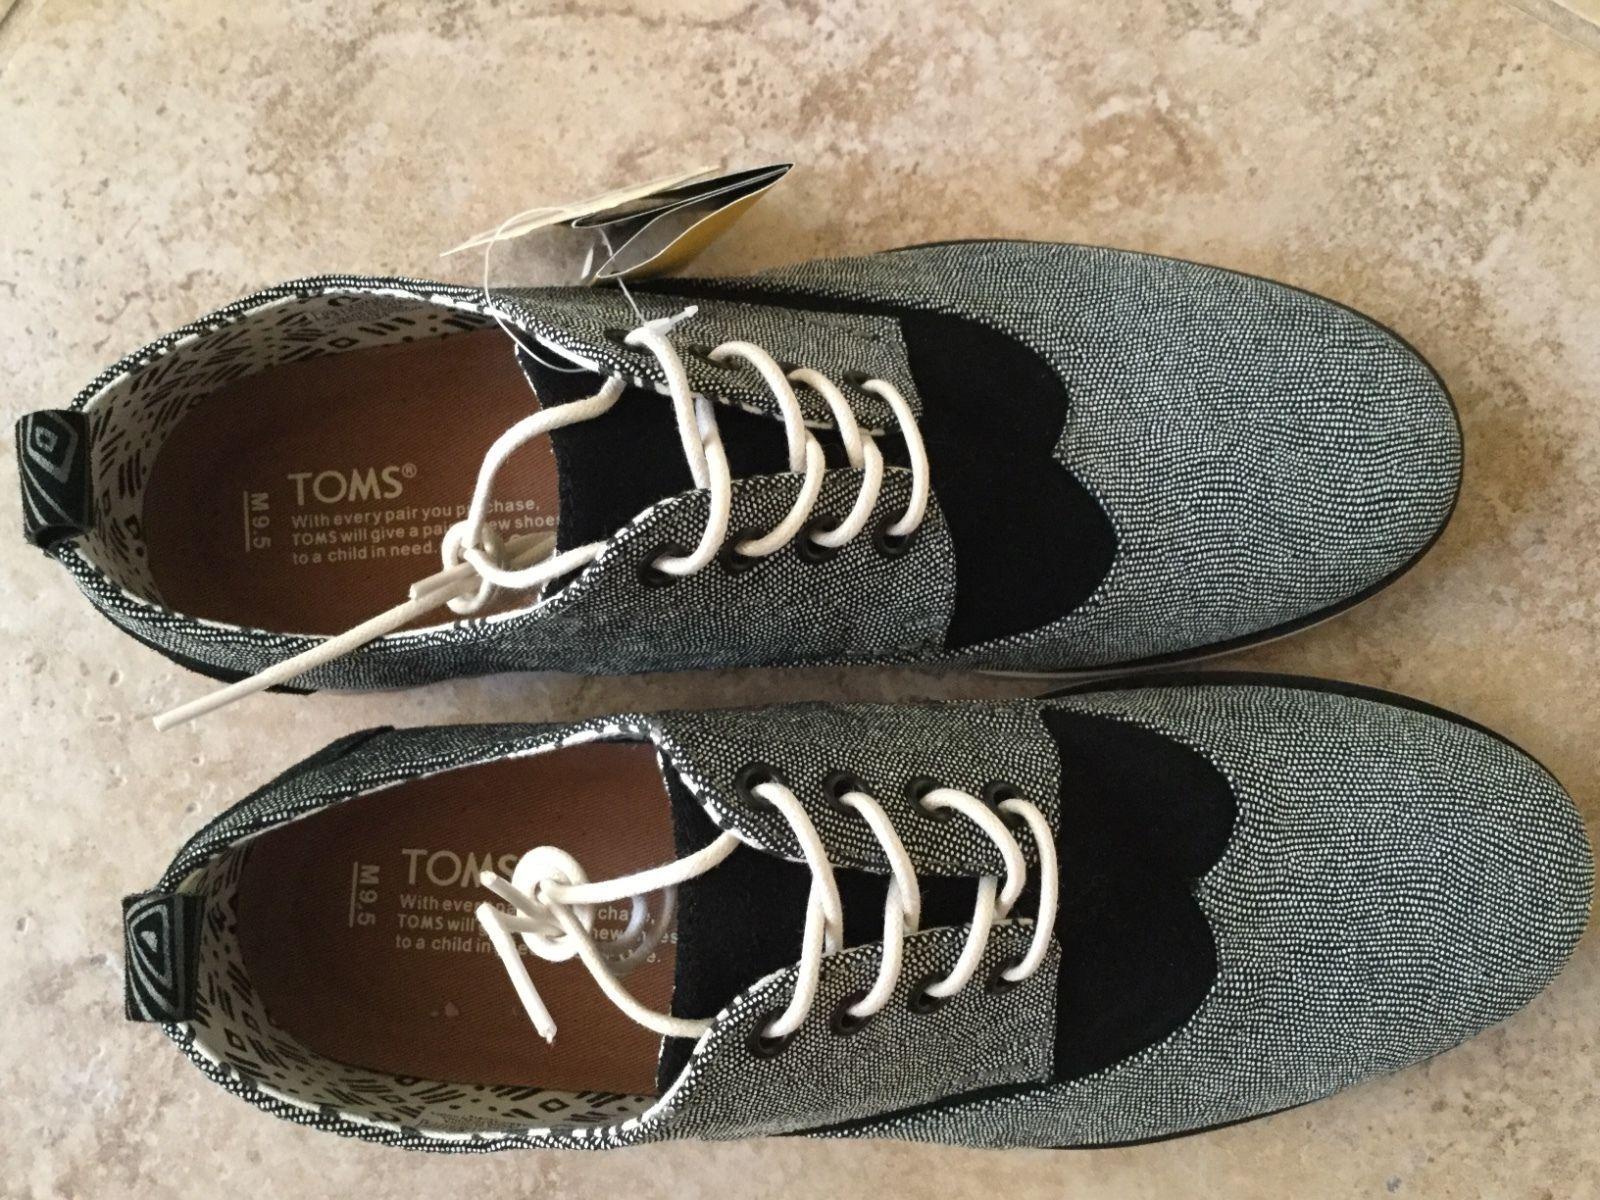 184fc229e1b NEW Toms Men s Brogue V Oxford Dress Shoes Sizes ++ Caviar Leather Vibram  Sole